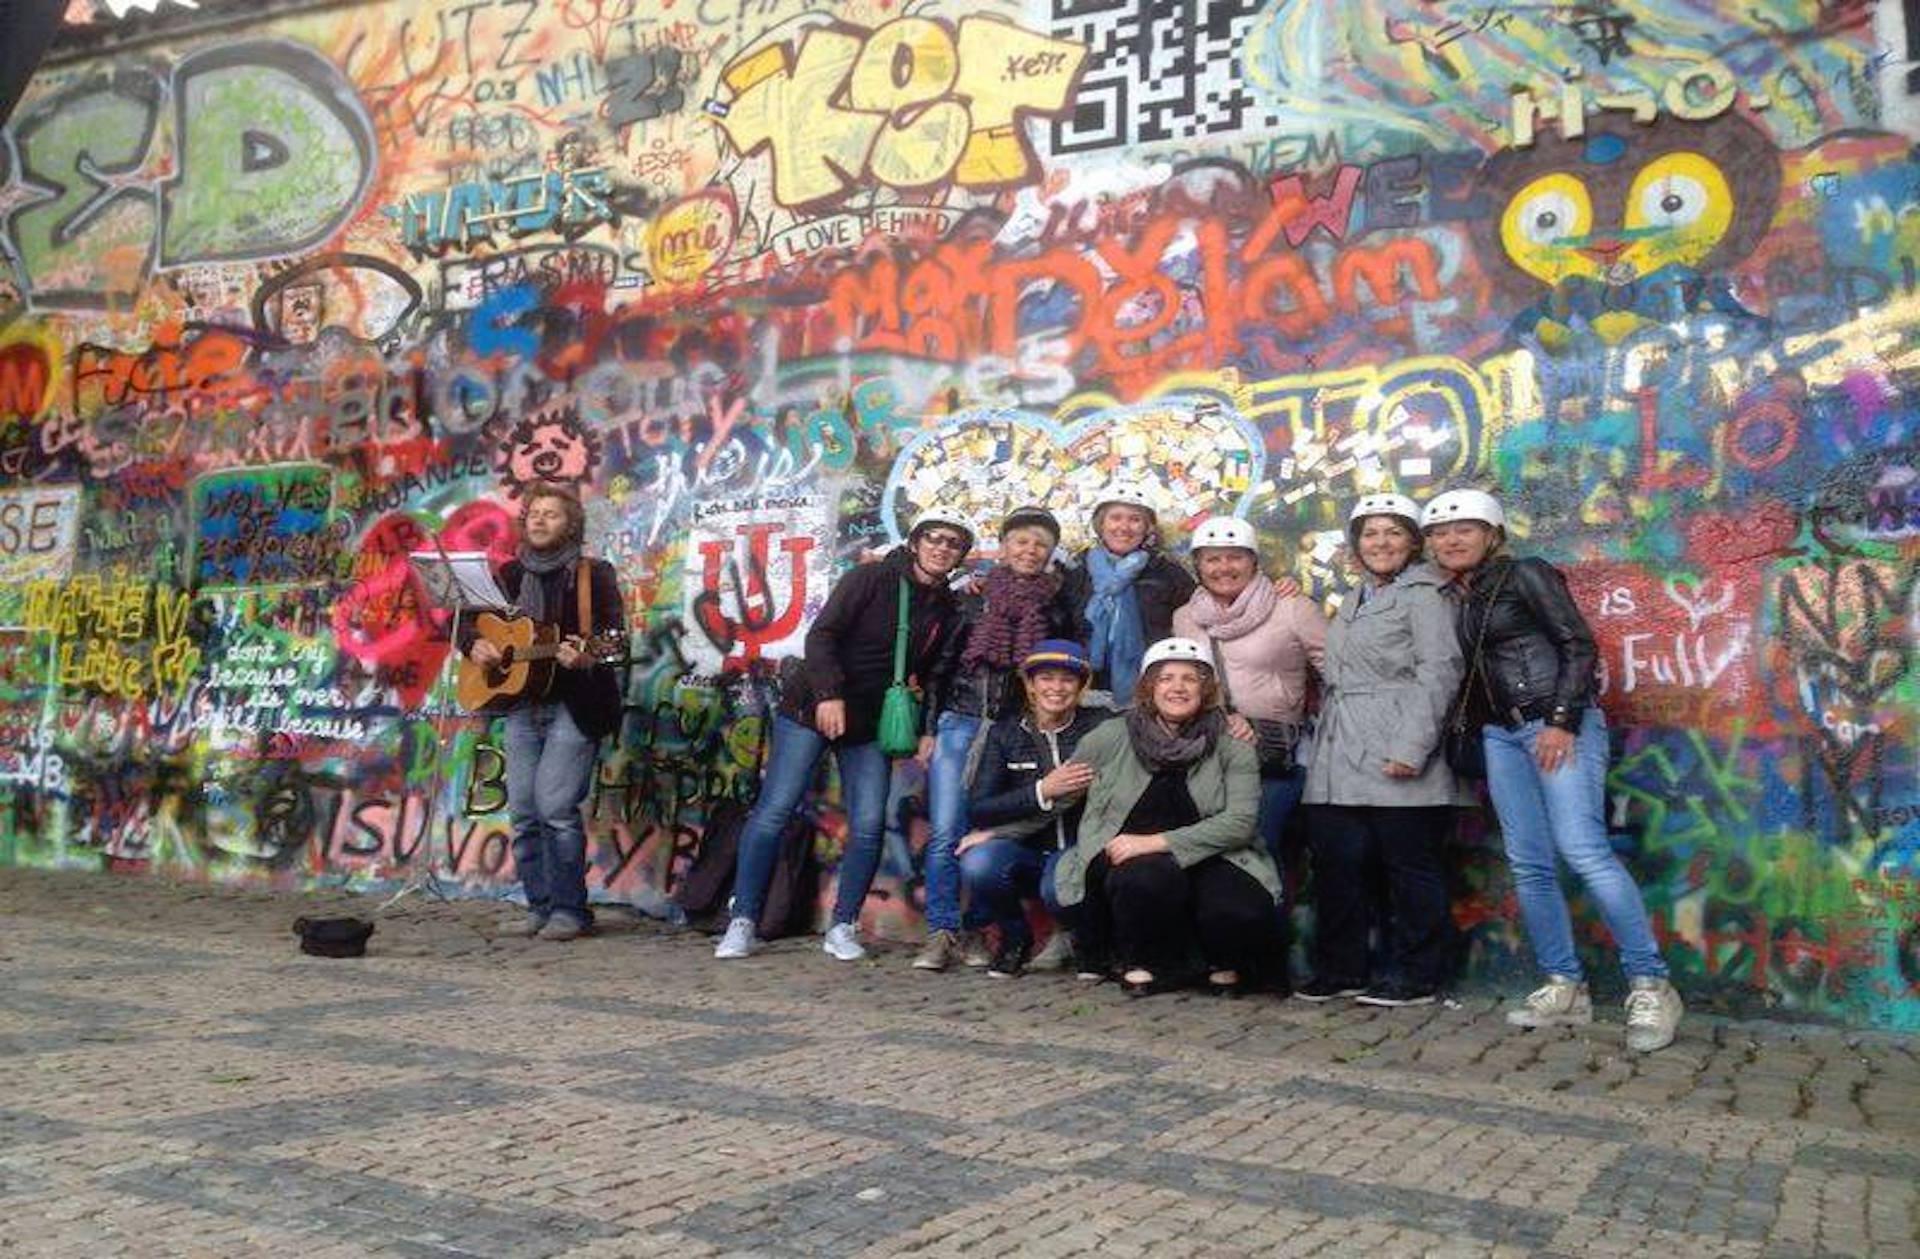 Groepsreis Praag stedentrip bedrijfsreizen